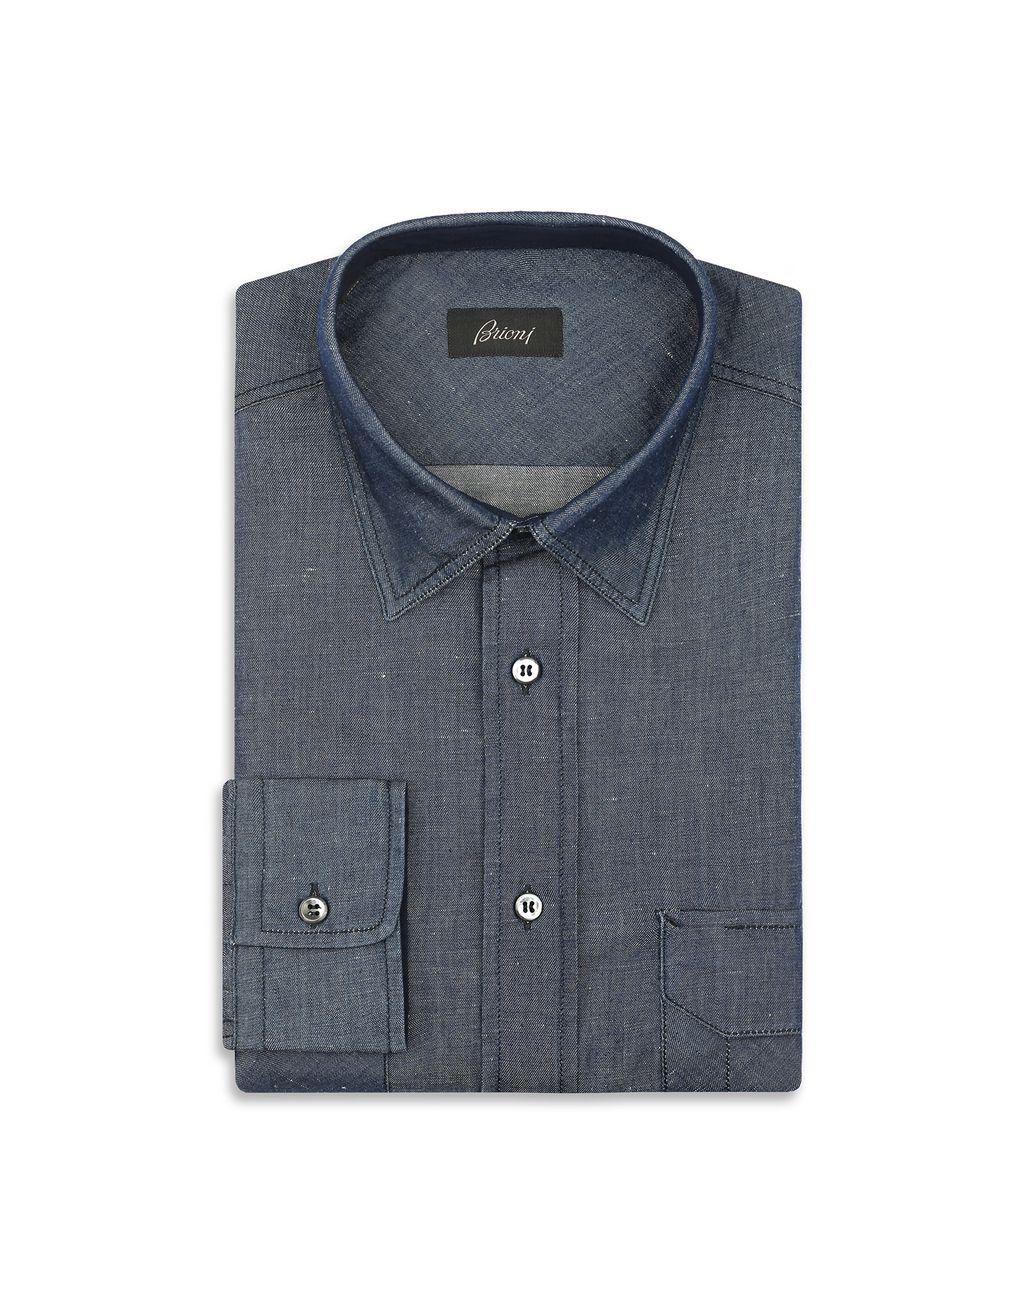 BRIONI Тёмно-синяя джинсовая рубашка Повседневная рубашка Для Мужчин f